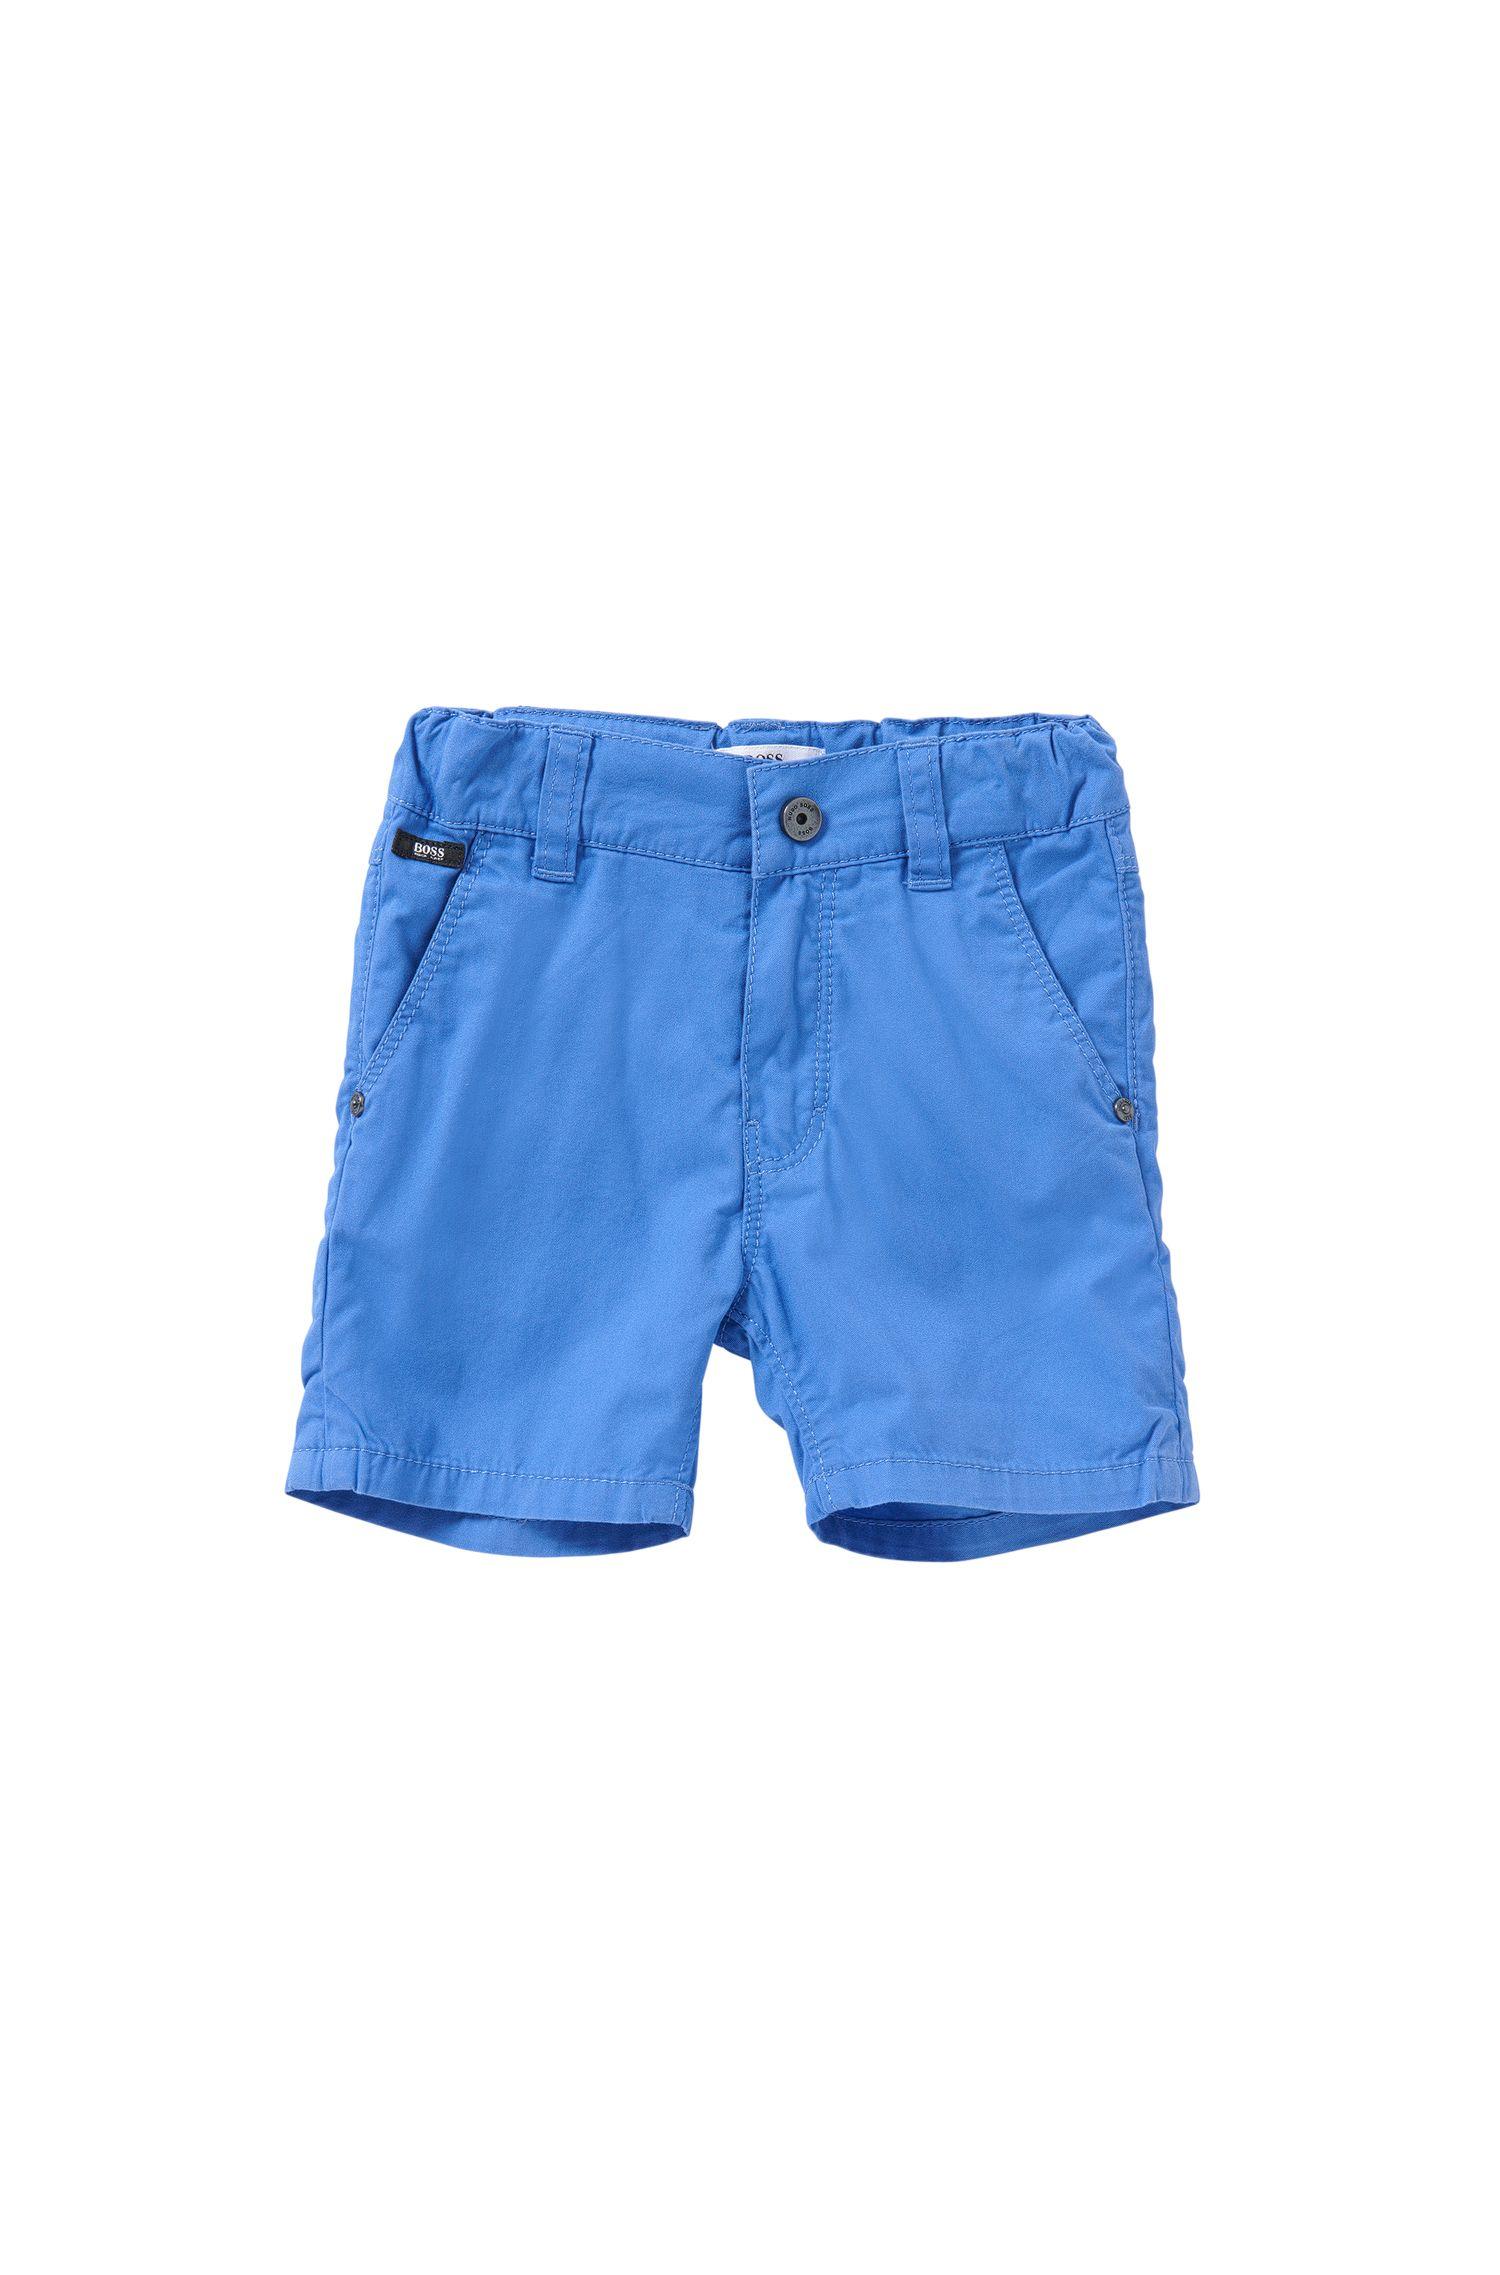 Shorts regular fit en algodón para bebé: 'J04218'